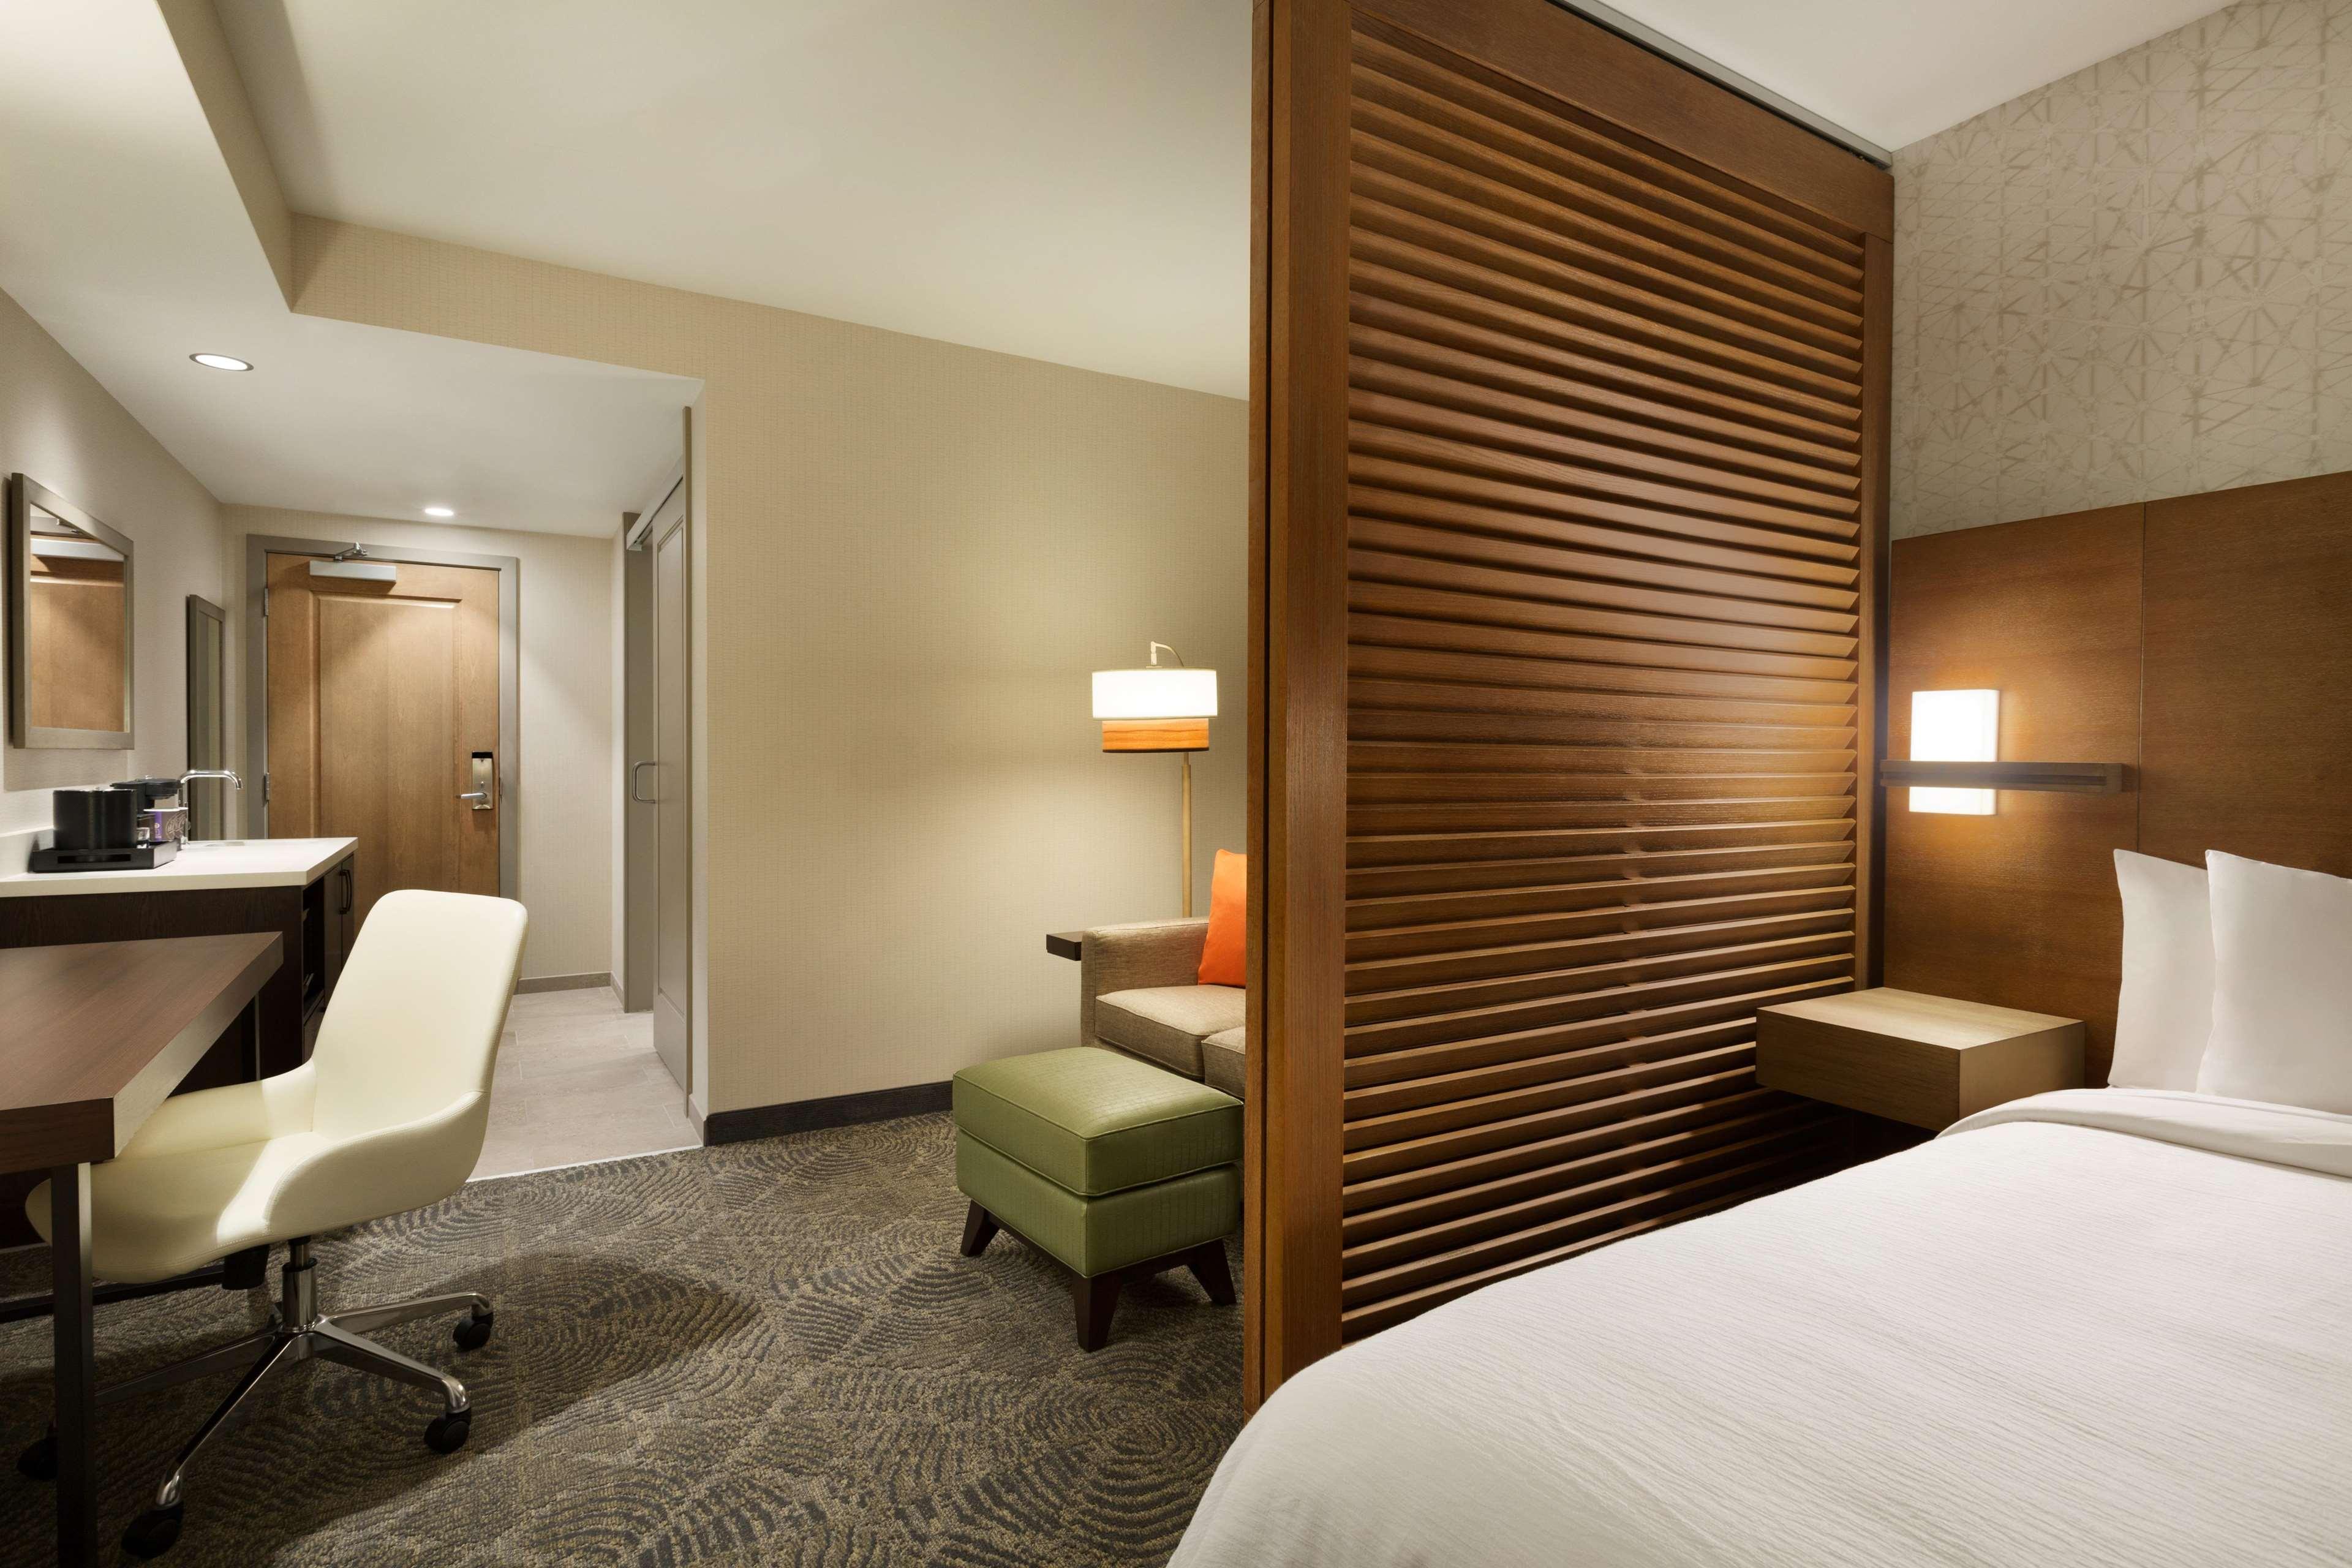 Embassy Suites by Hilton Oahu Kapolei image 23